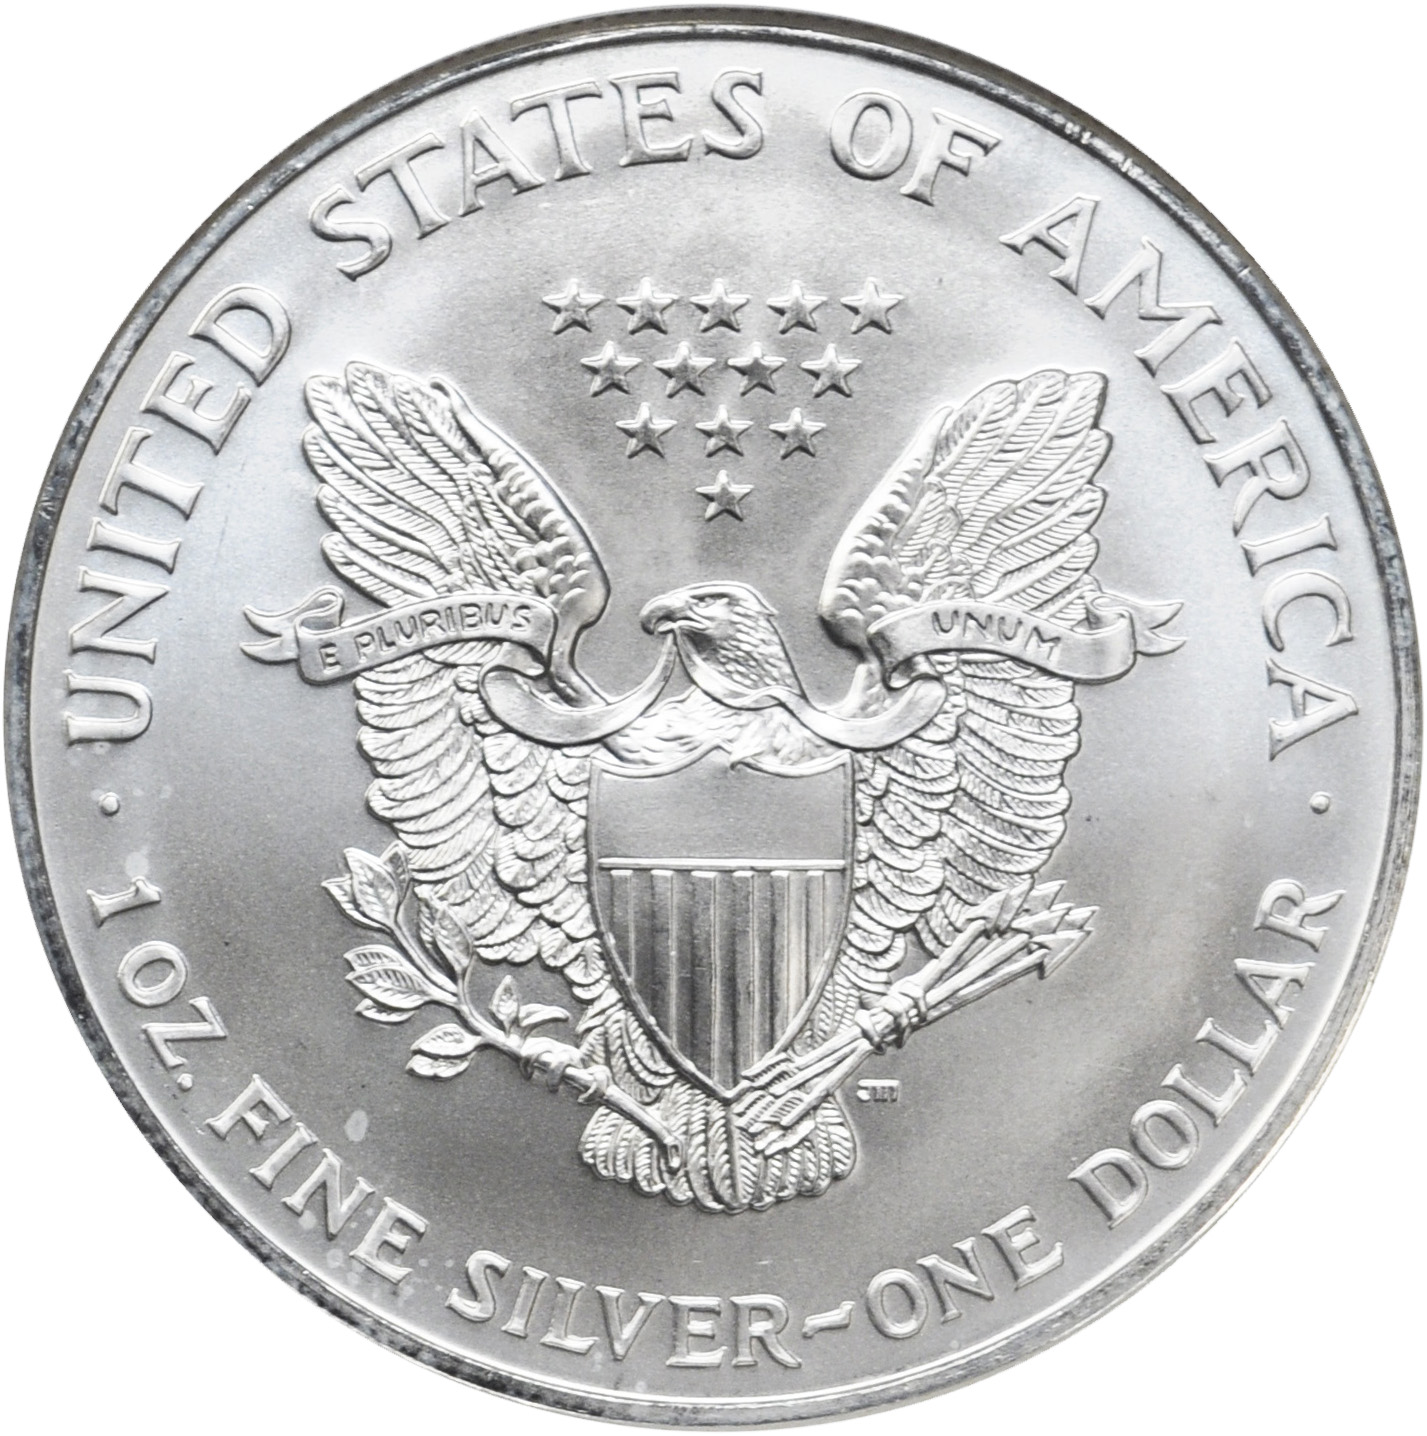 American Silver Eagle Coin Bullion-Littleton Walking Liberty L@@K! Spot 1997